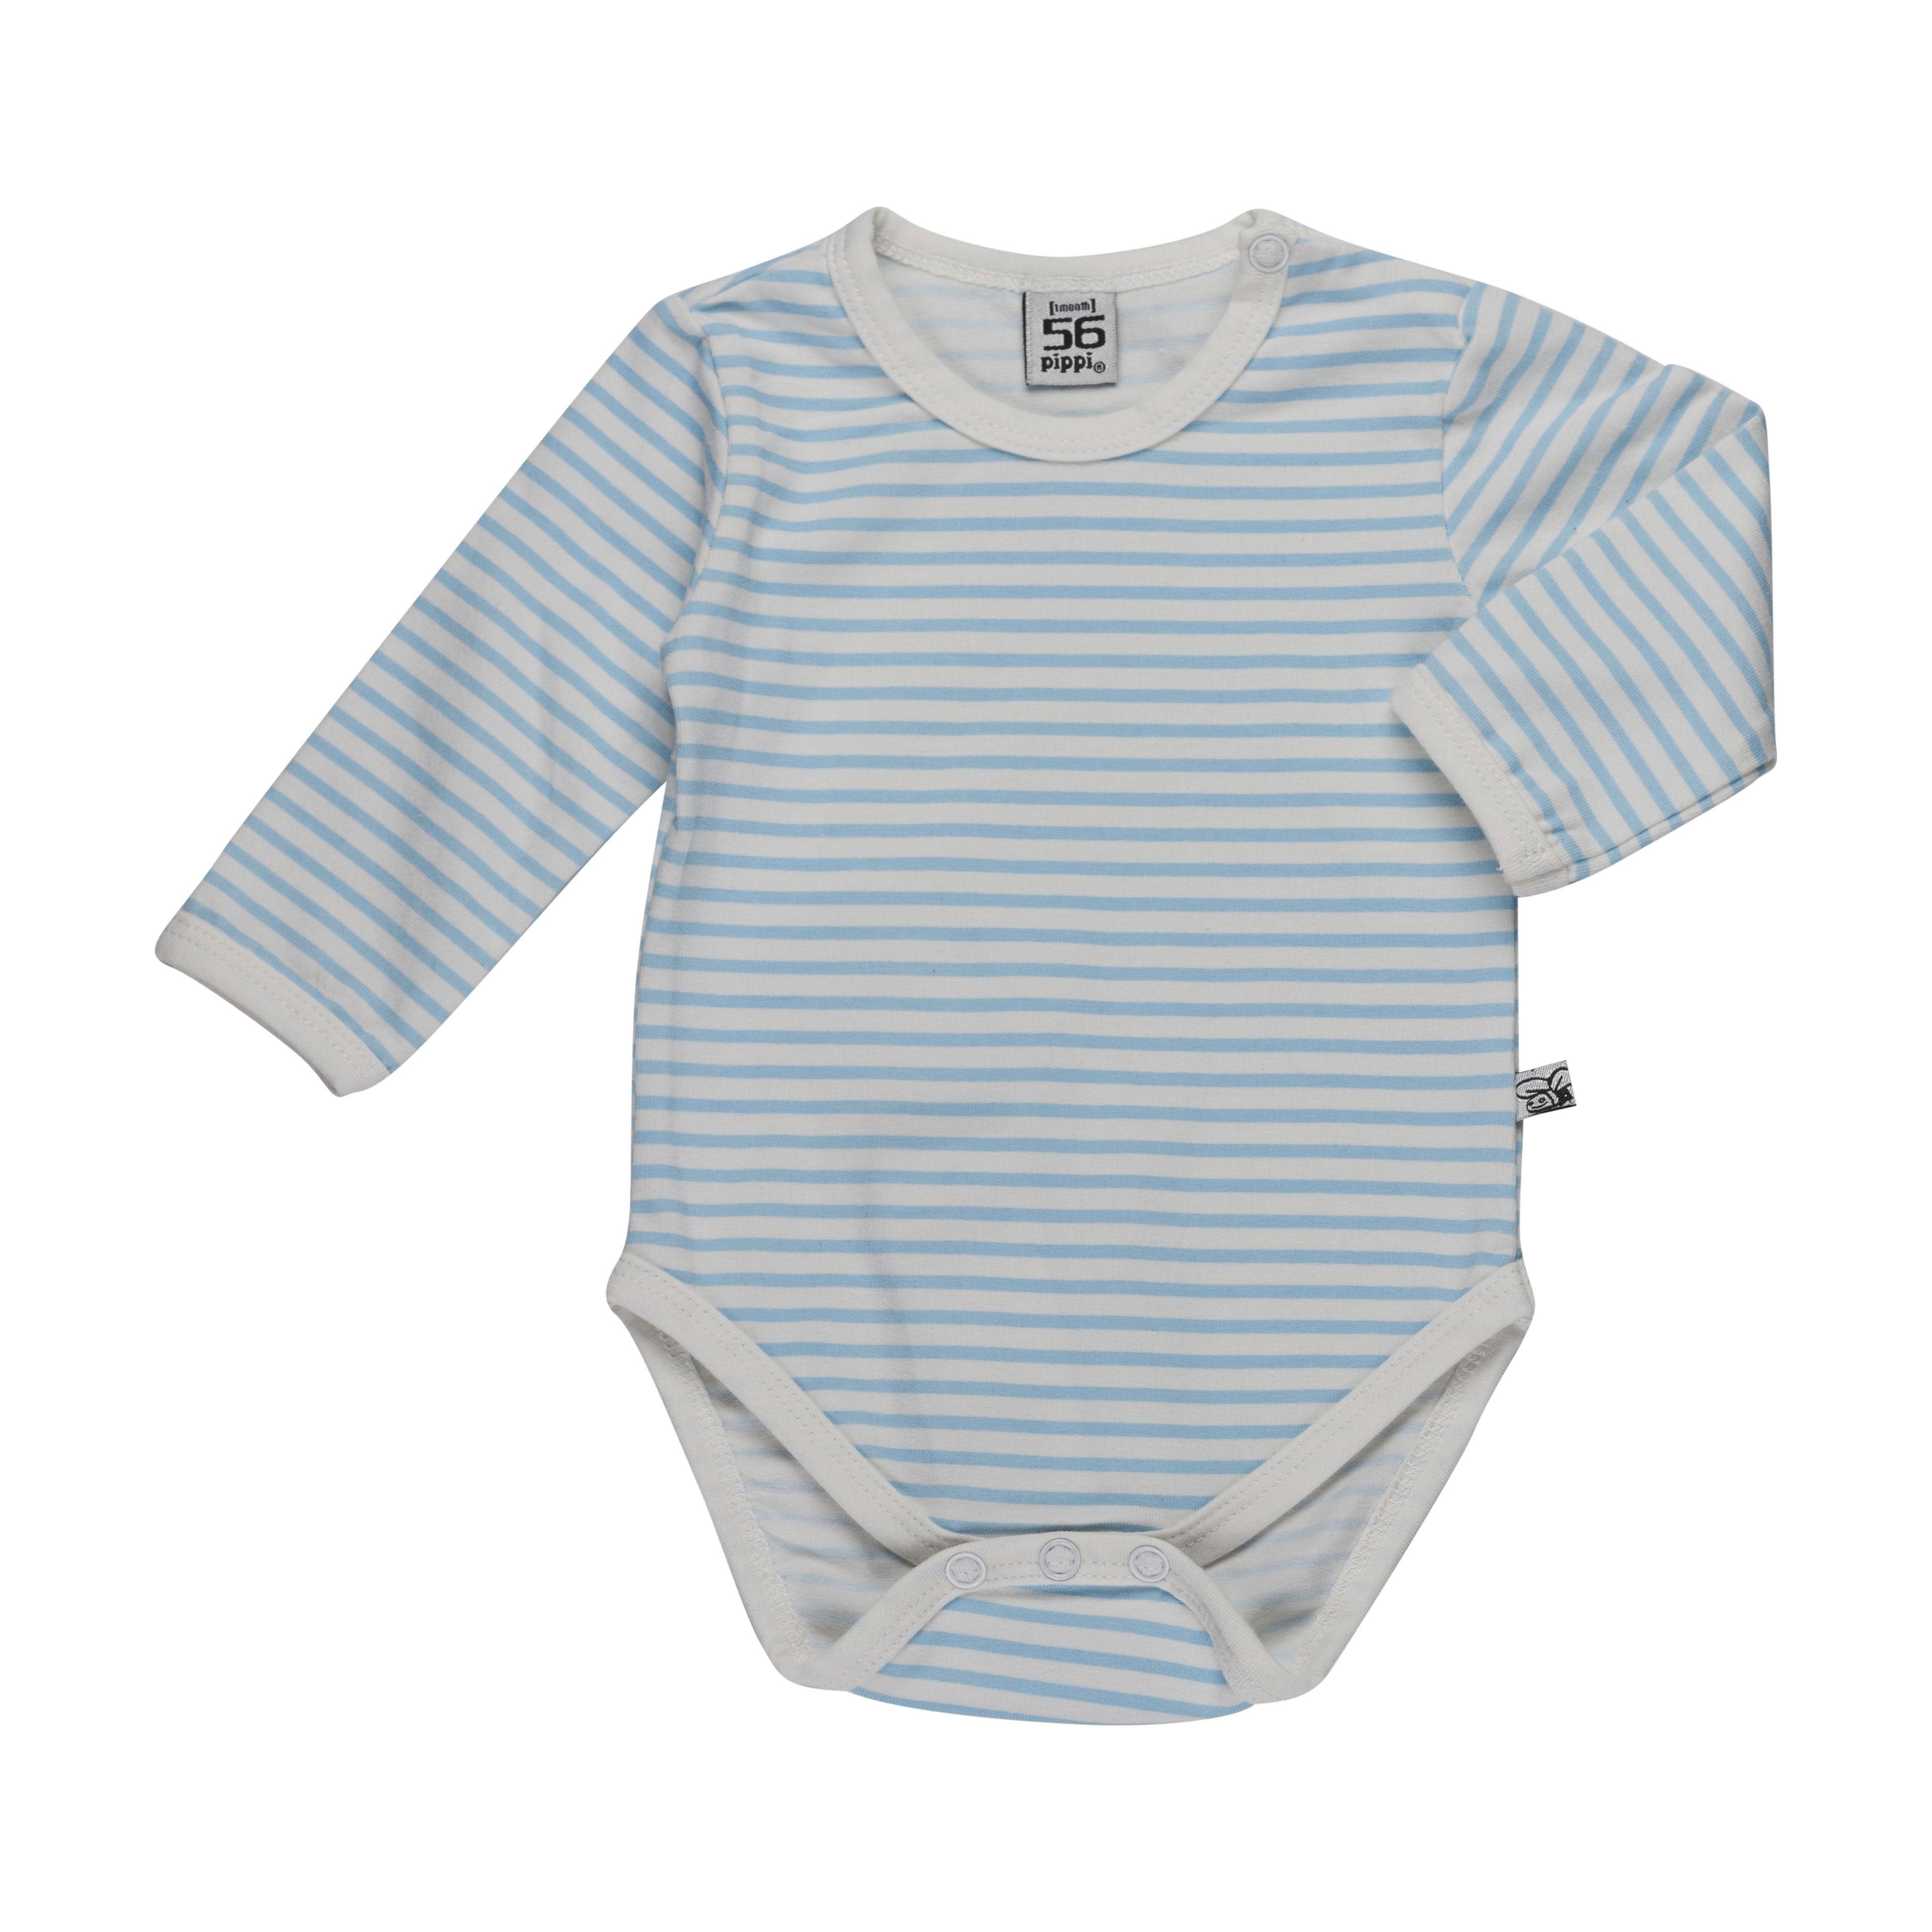 Image of   Body fra Pippi i økologisk bomuld - Blue Stripes